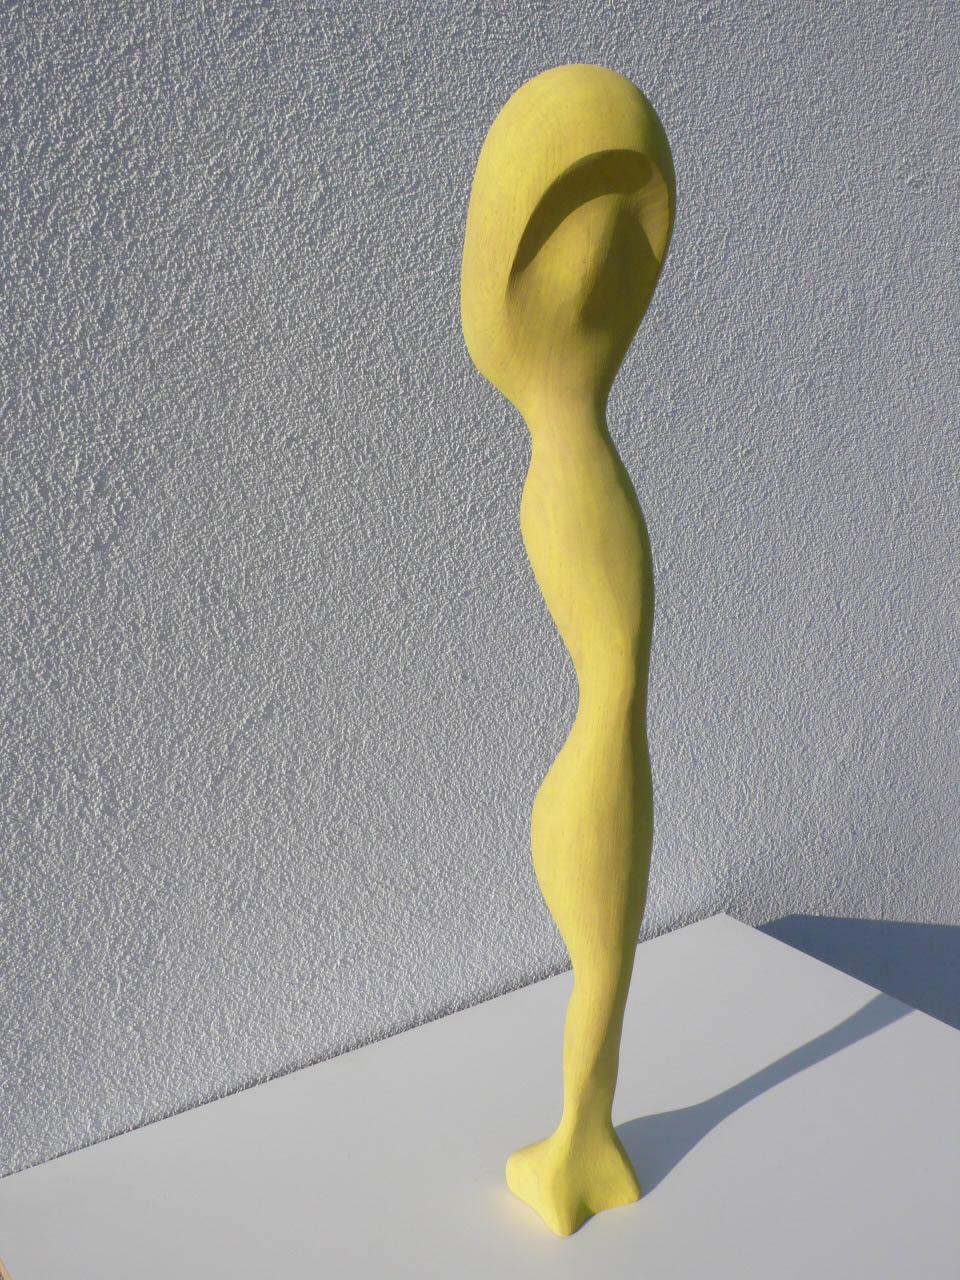 Marcel van Campen - Sammy-gold 2013